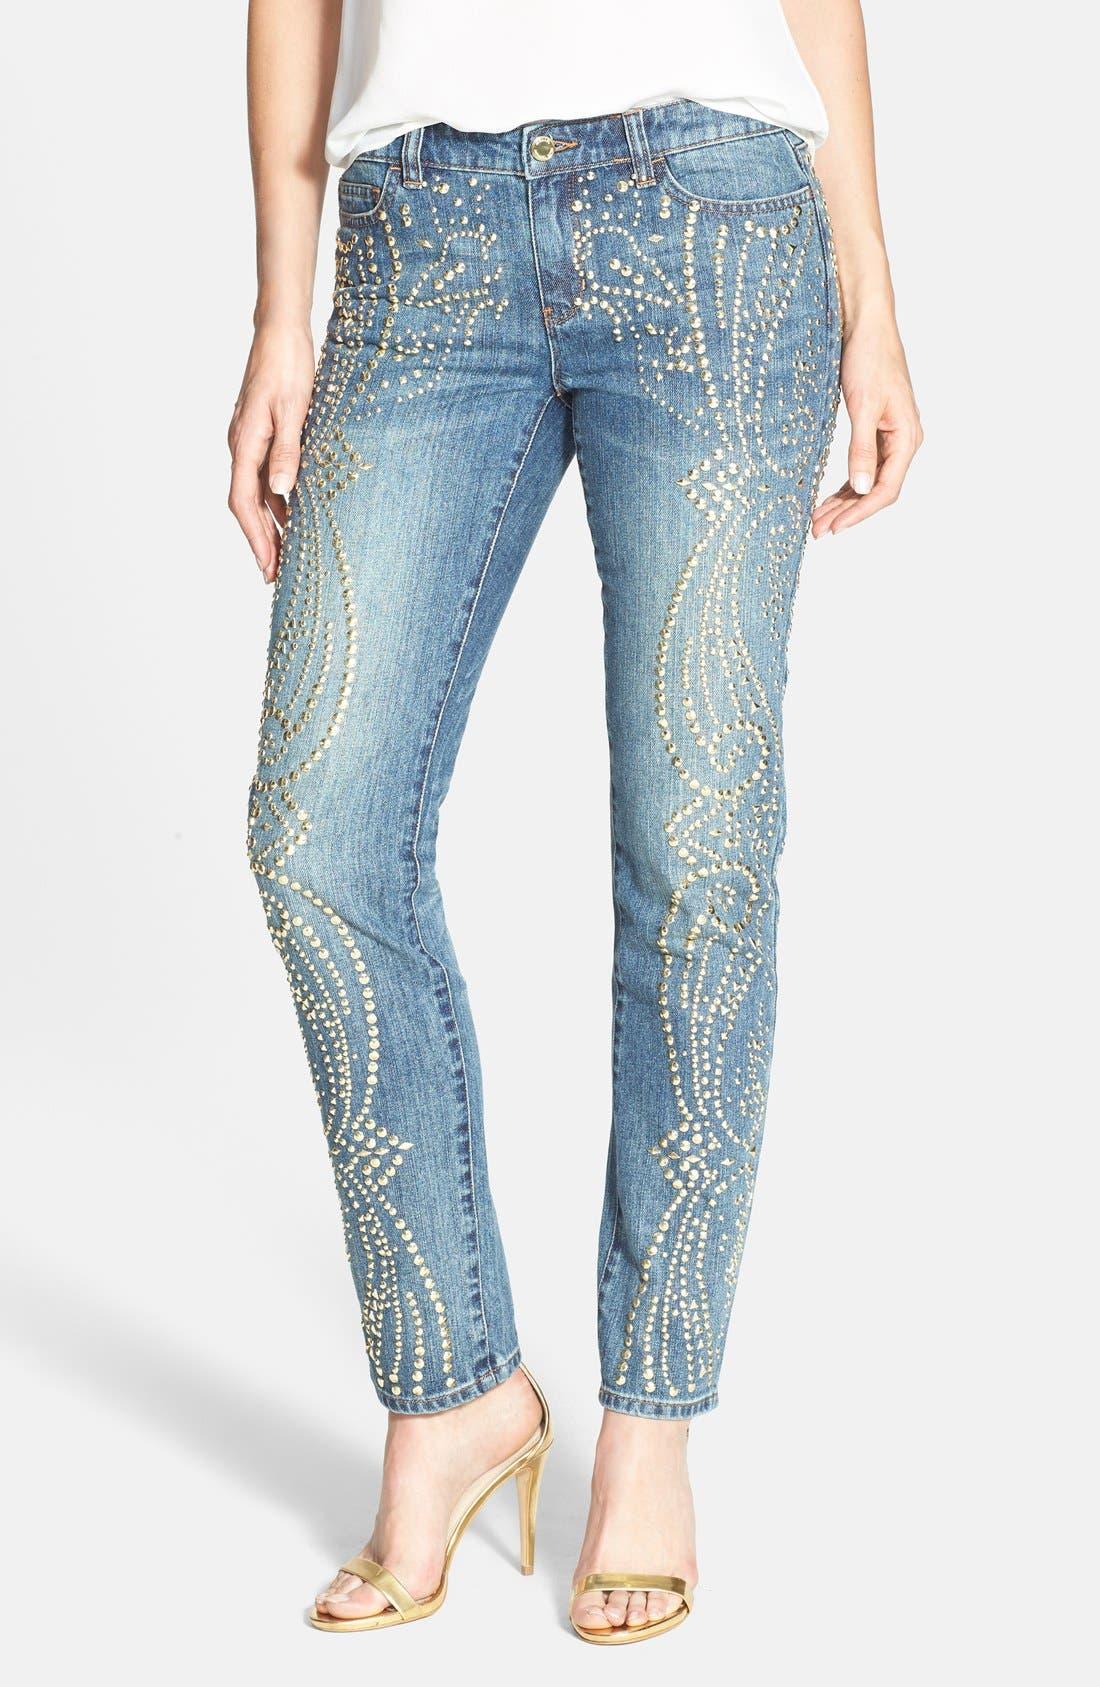 MICHAEL MICHAEL KORS Studded Ankle Boyfriend Jeans